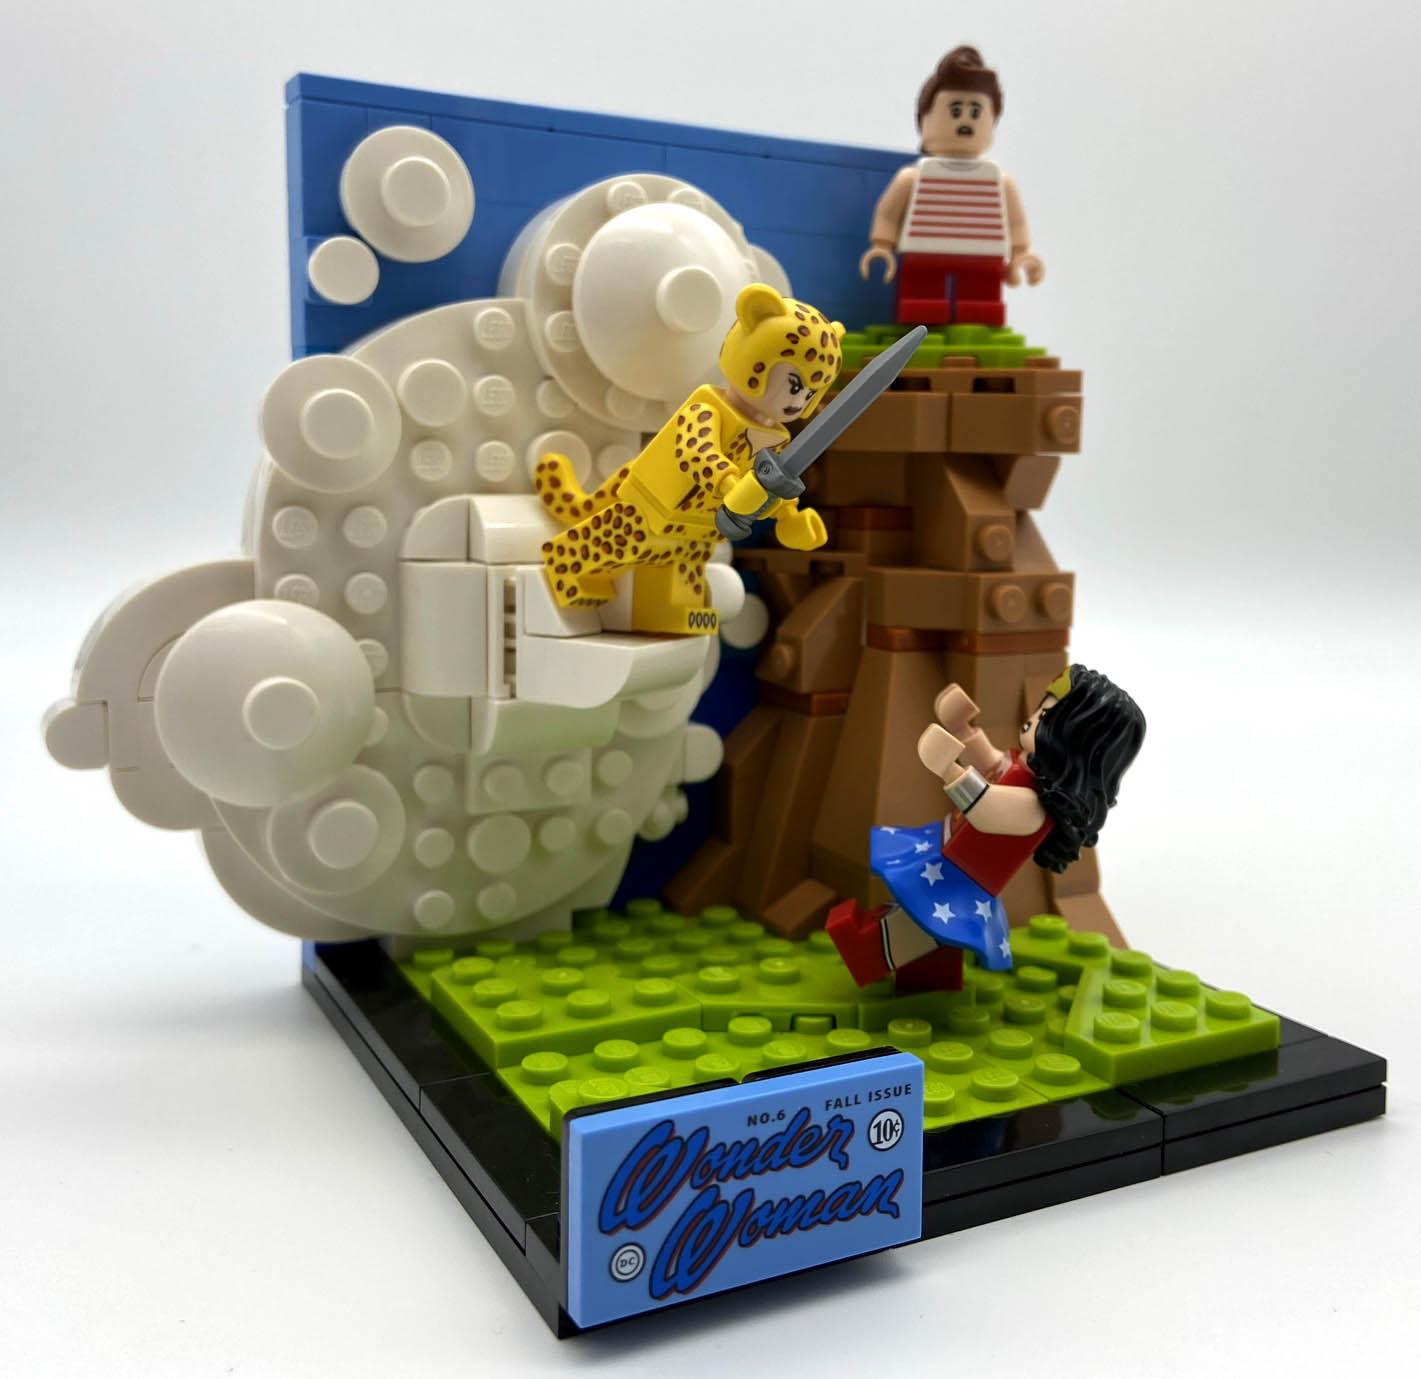 LEGO DC 77906 Wonder Woman das Set